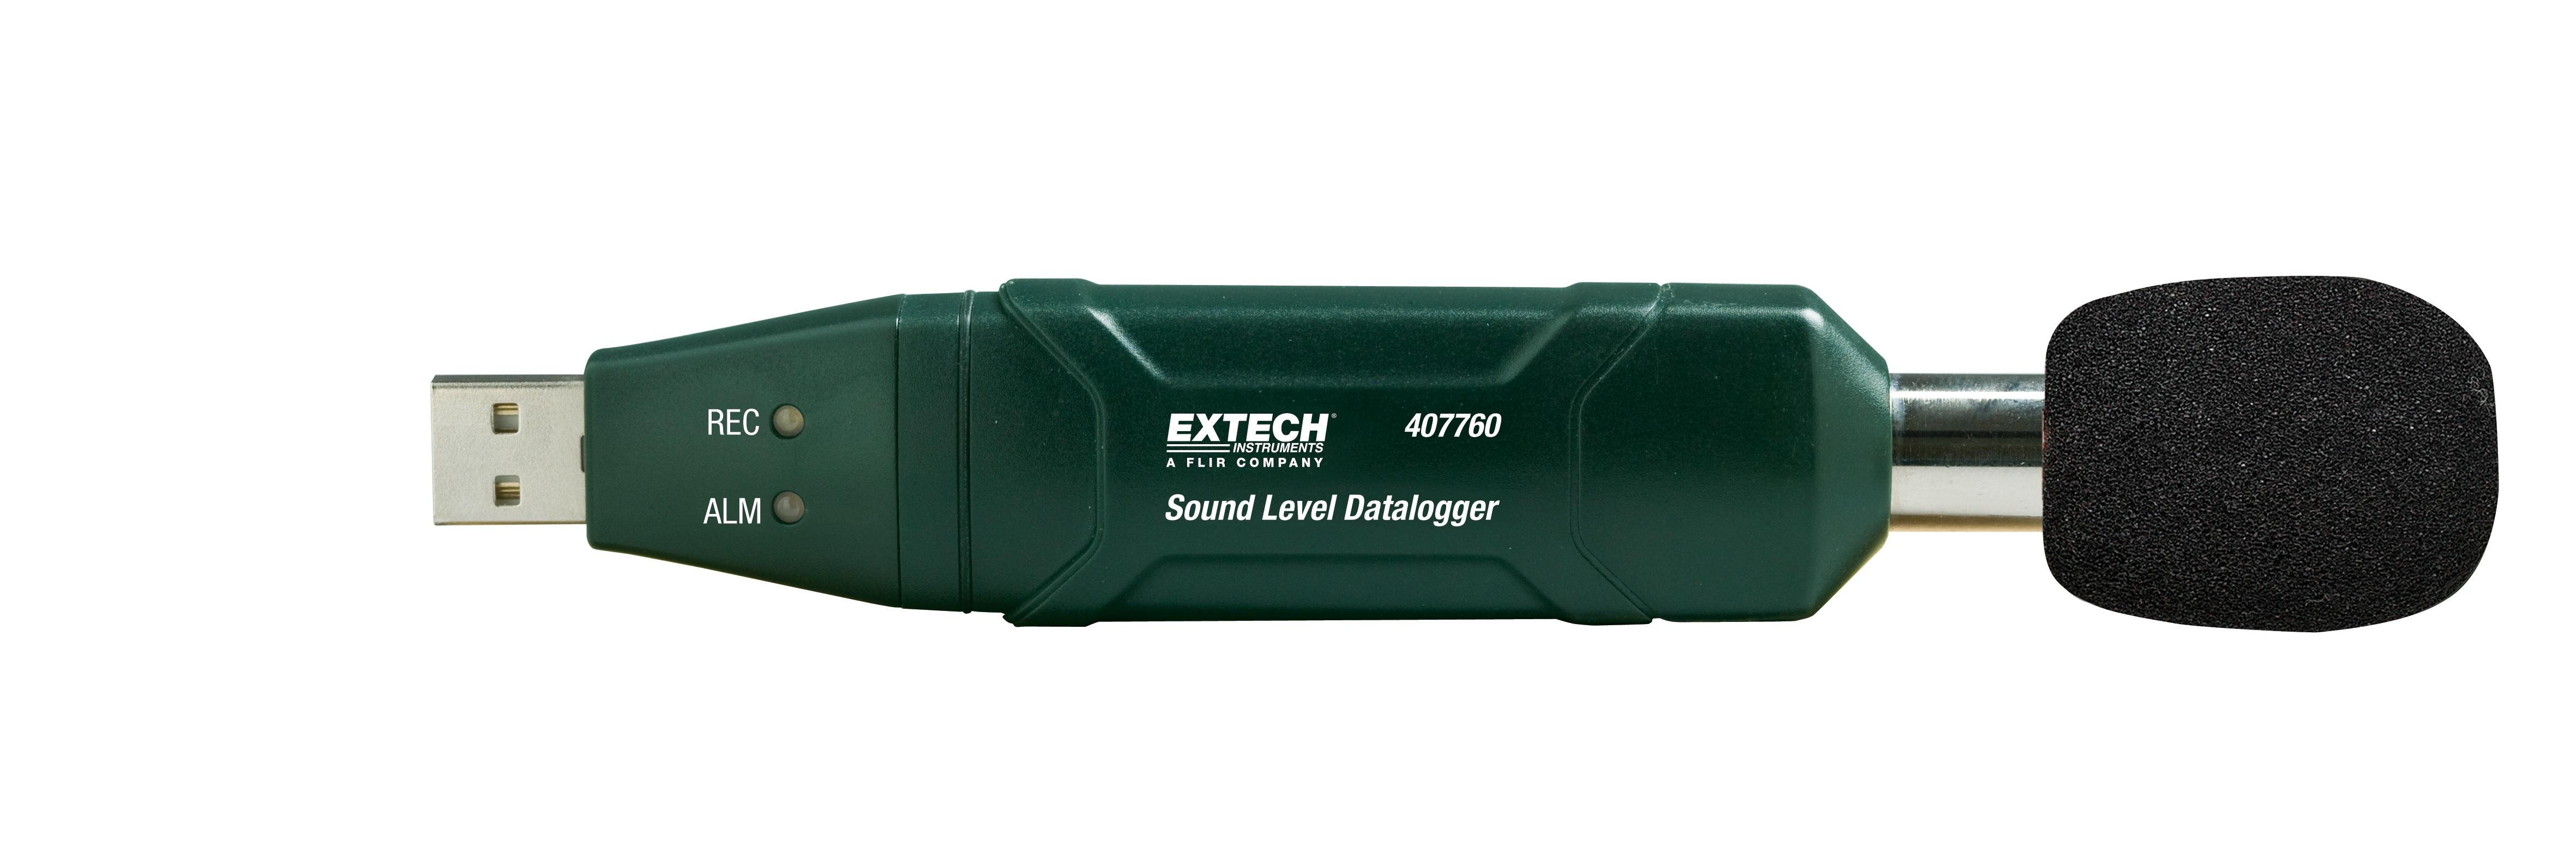 Extech 407760 เครื่องวัดเสียง